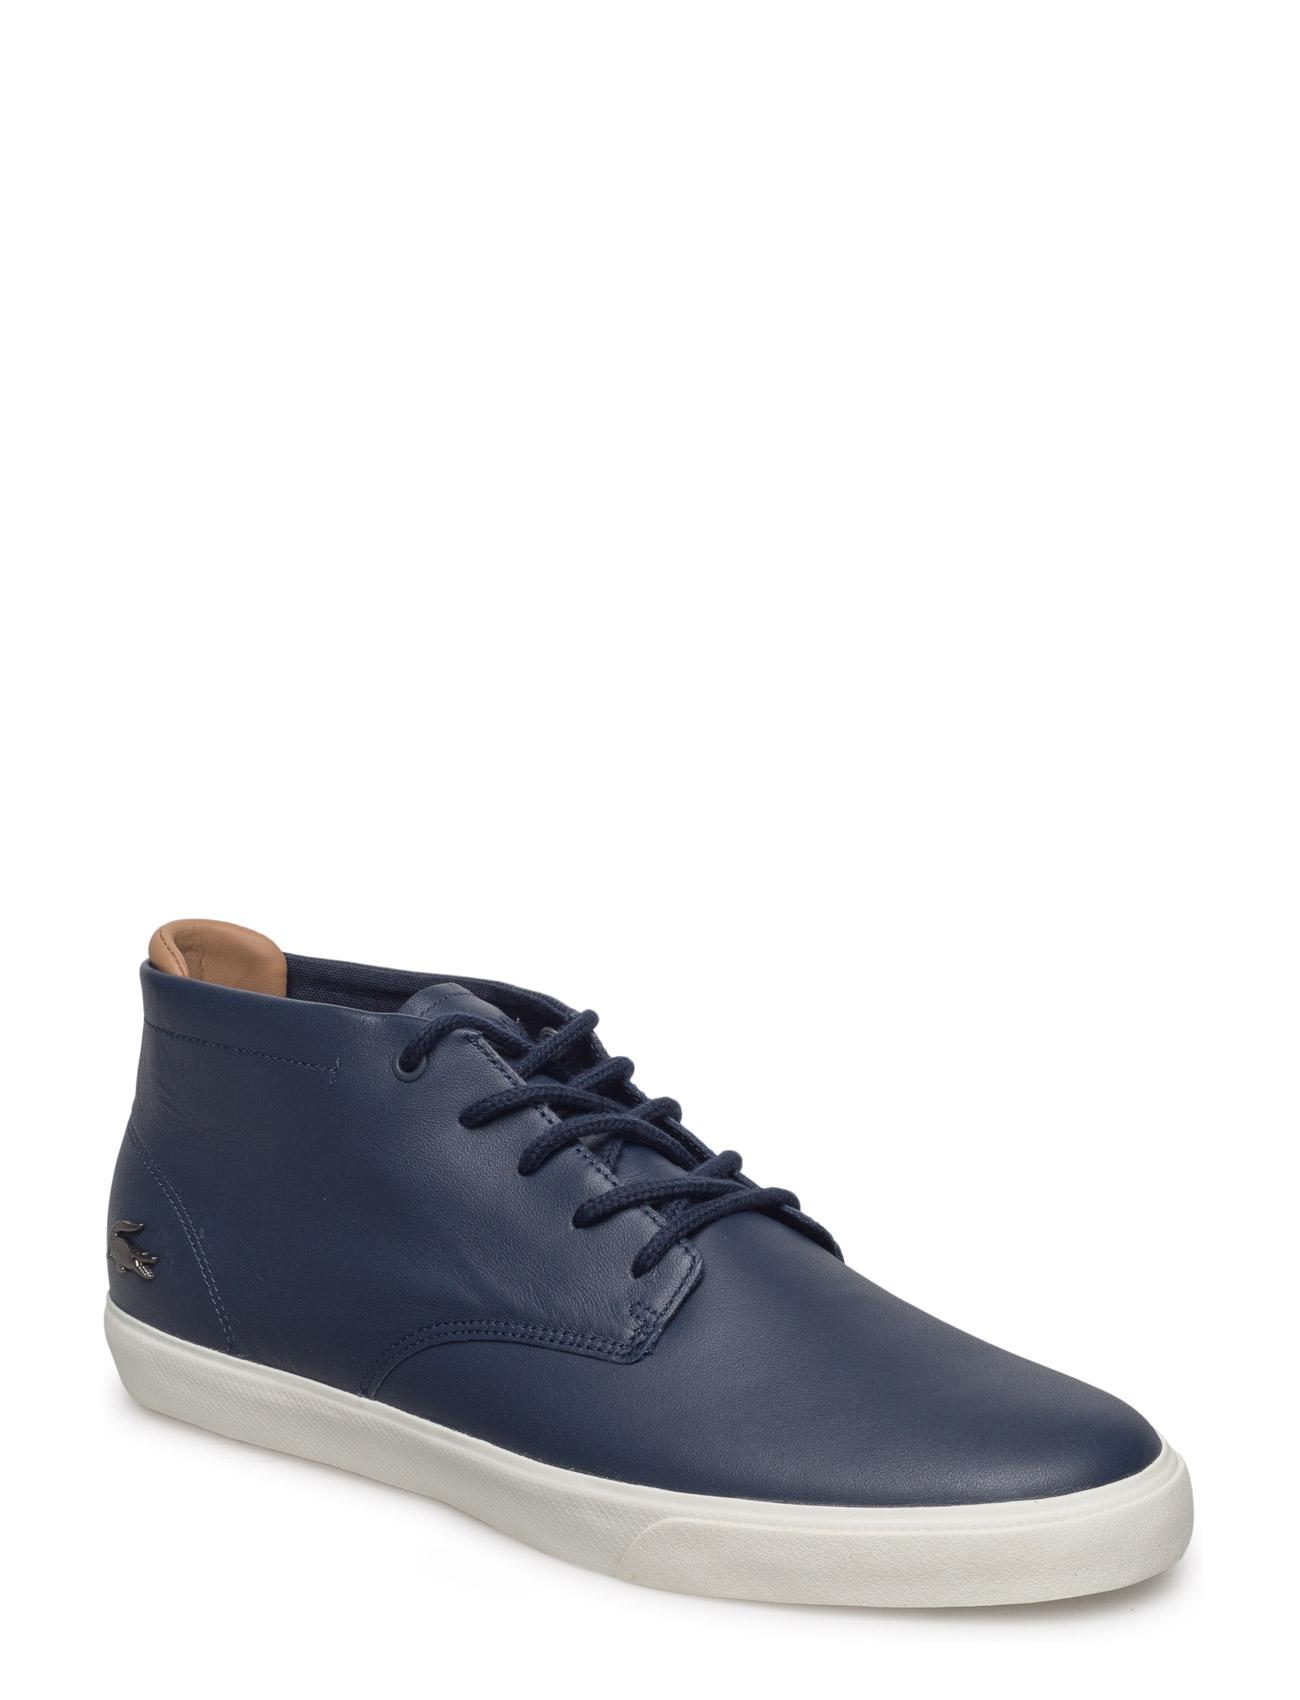 lacoste shoes Espere chukka 317 1 på boozt.com dk